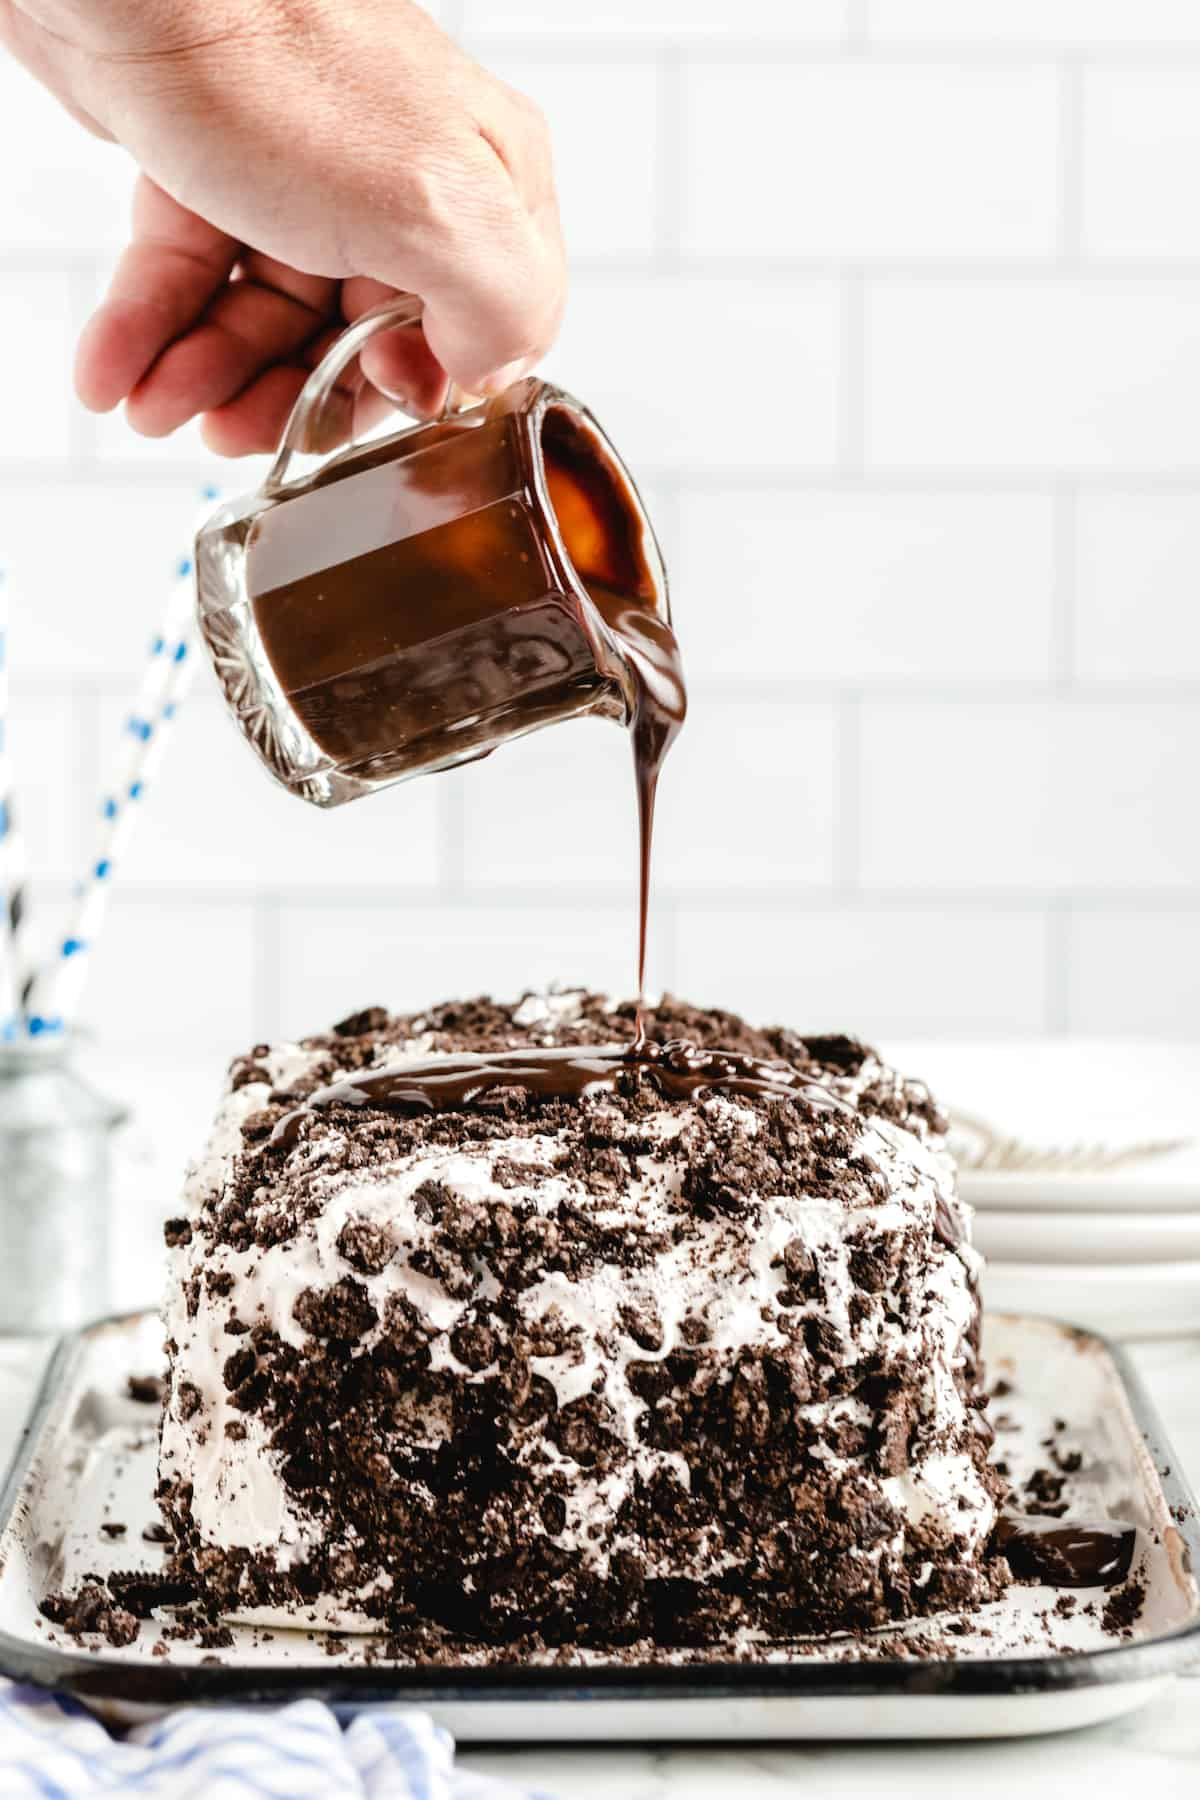 No Bake Ice Cream Sandwich Cake with hot fudge